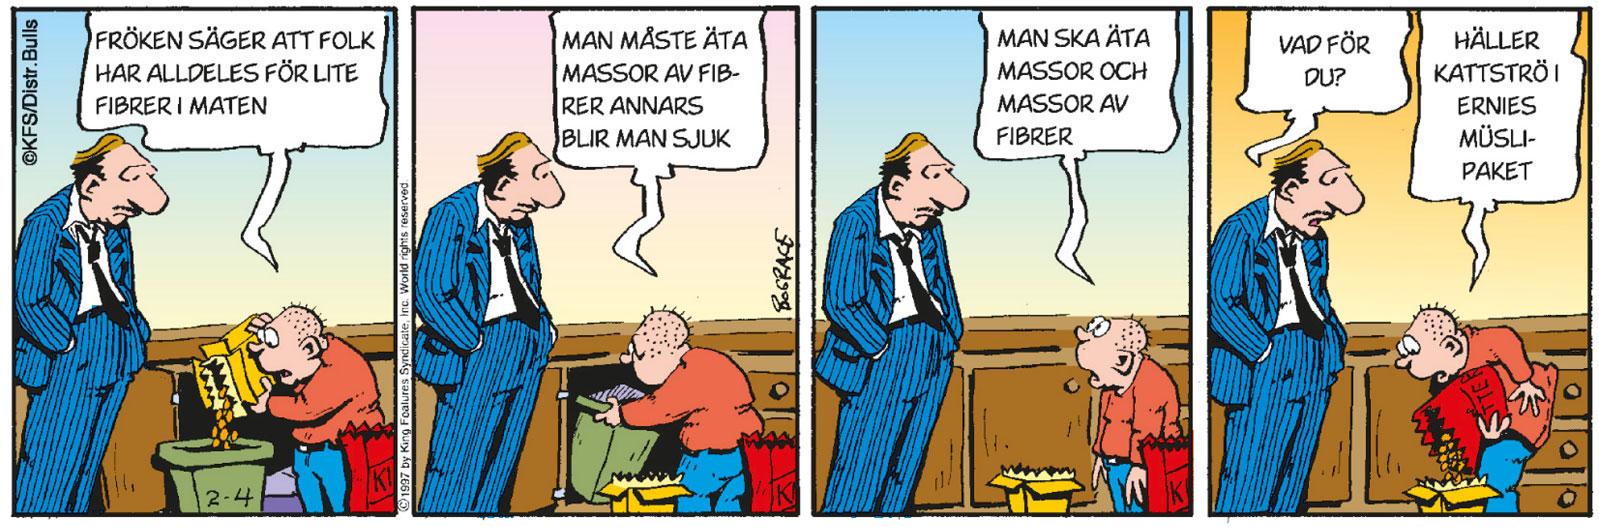 Ernies Farbror